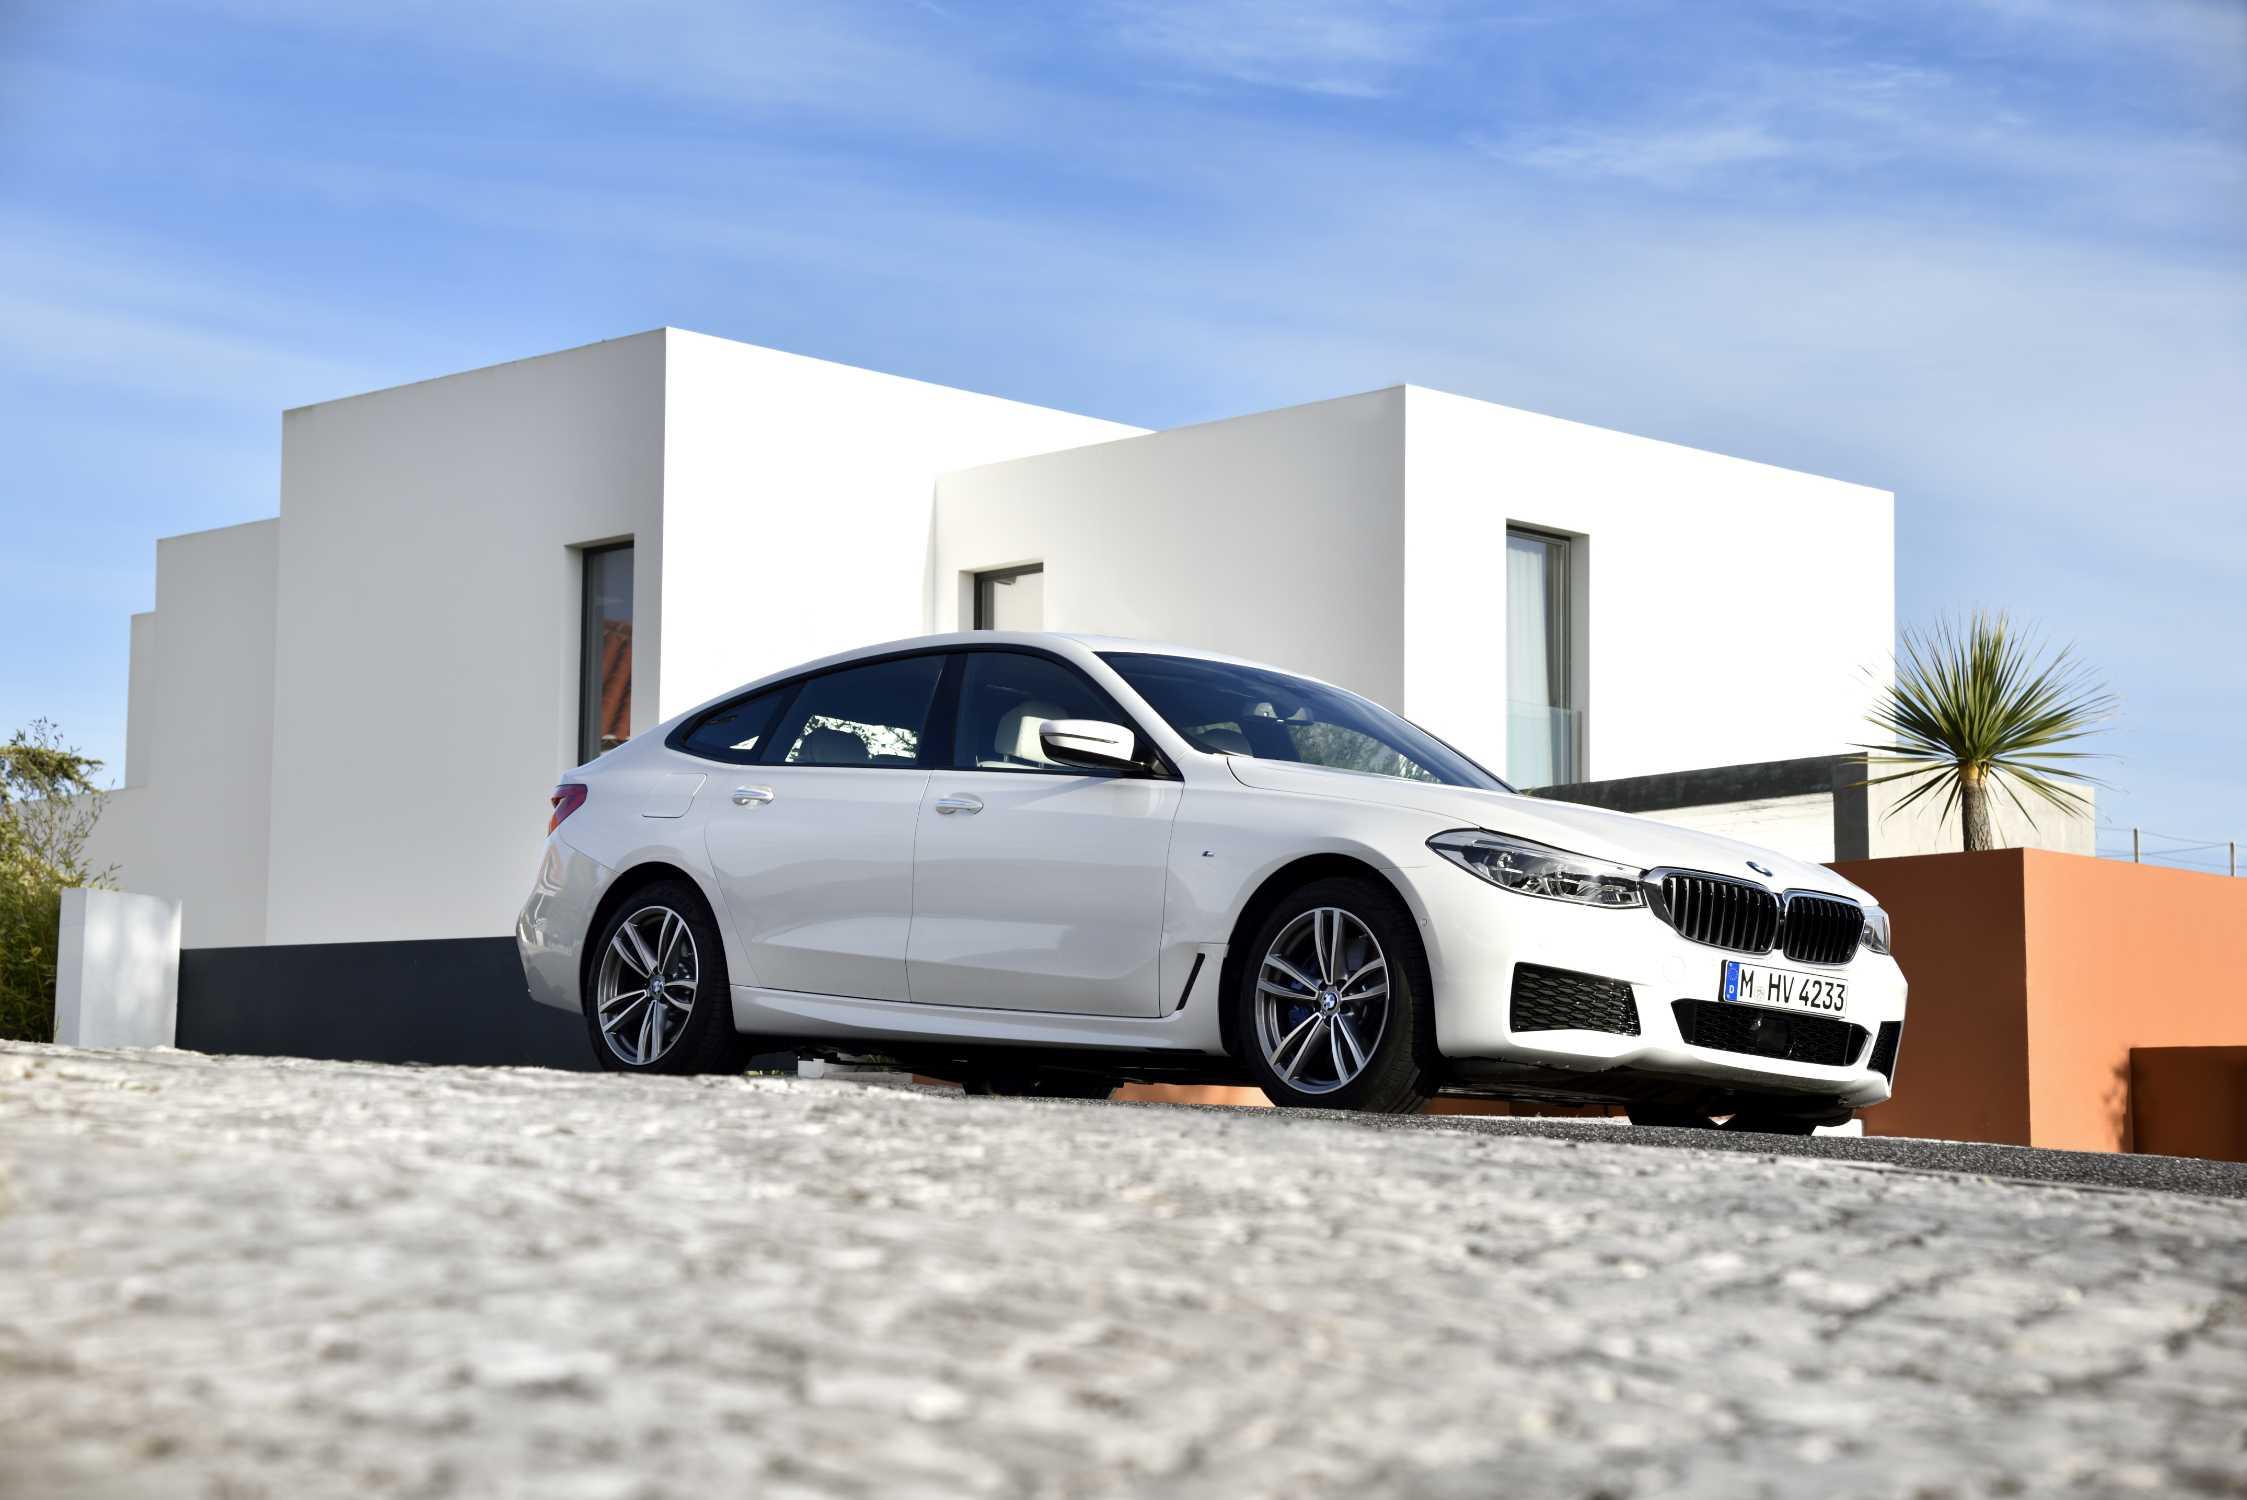 BMW 6 Series Gran Turismo, 640i xDrive, Mineral White ...